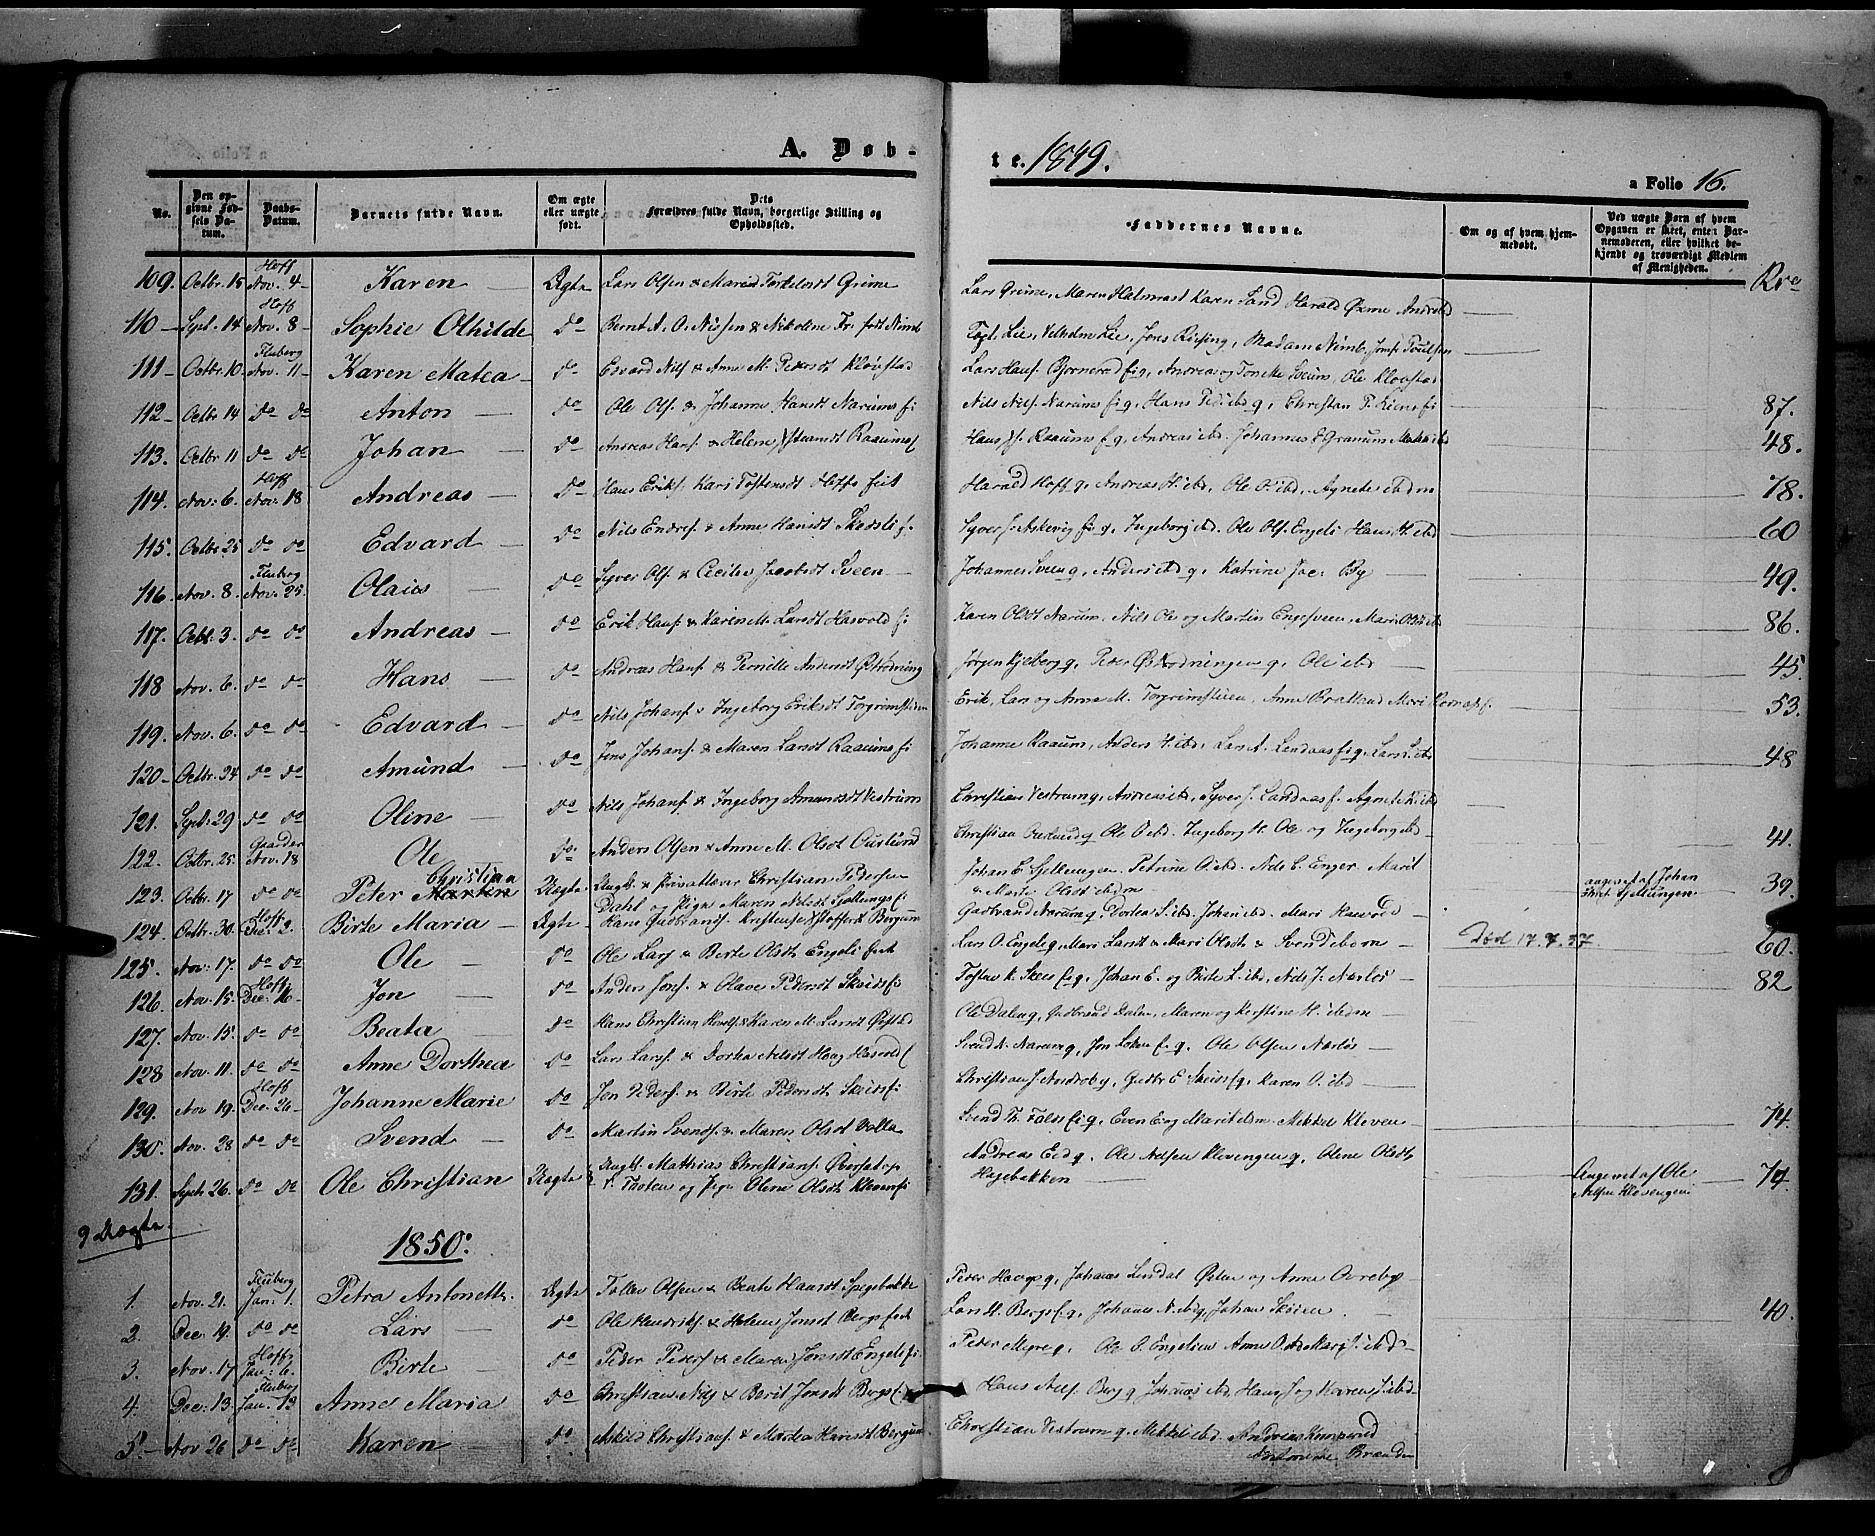 SAH, Land prestekontor, Ministerialbok nr. 9, 1847-1859, s. 16